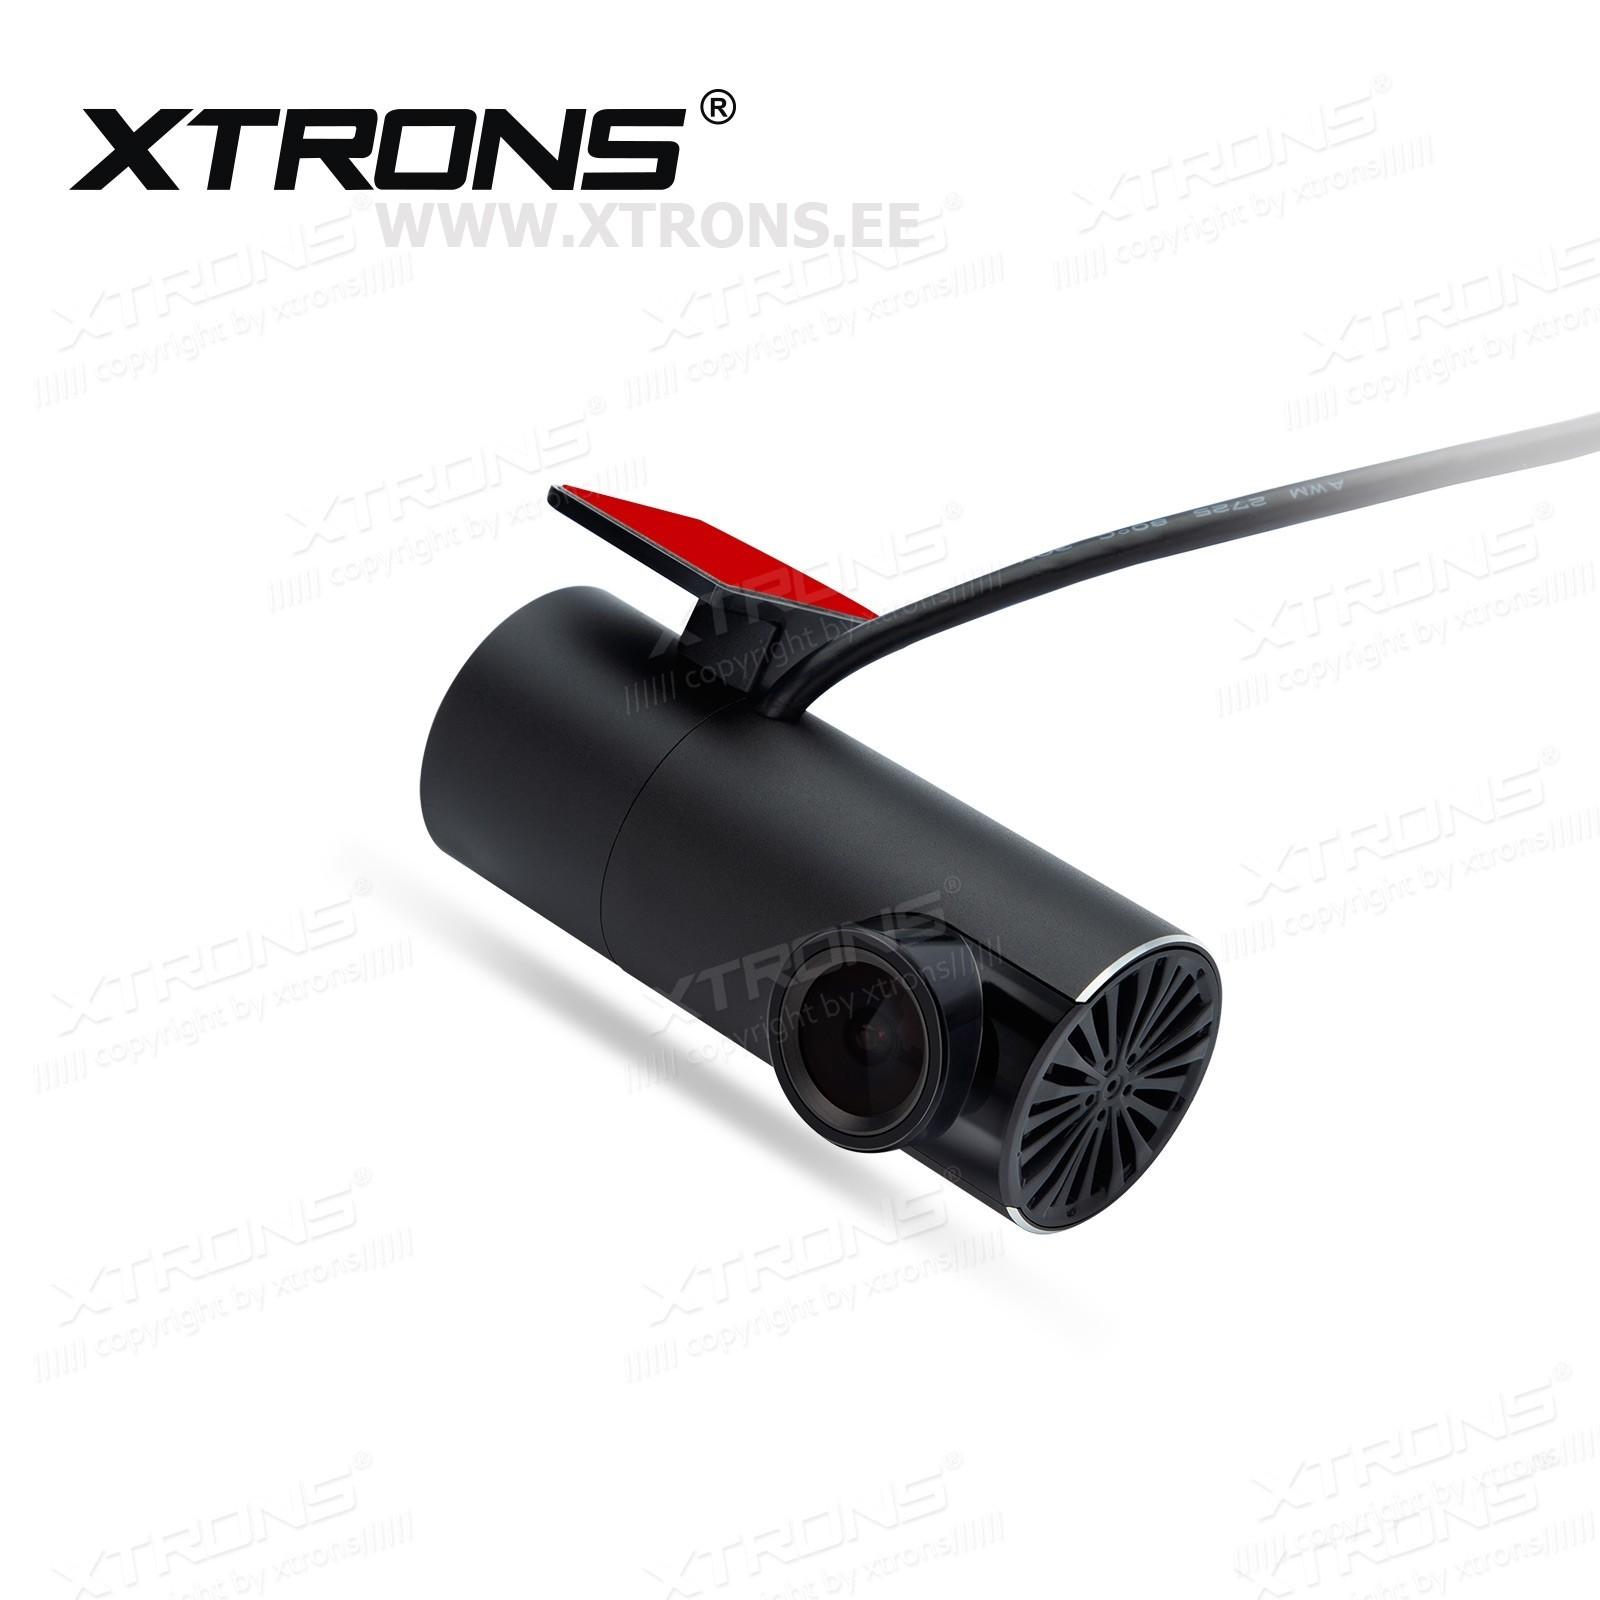 XTRONS DVR023